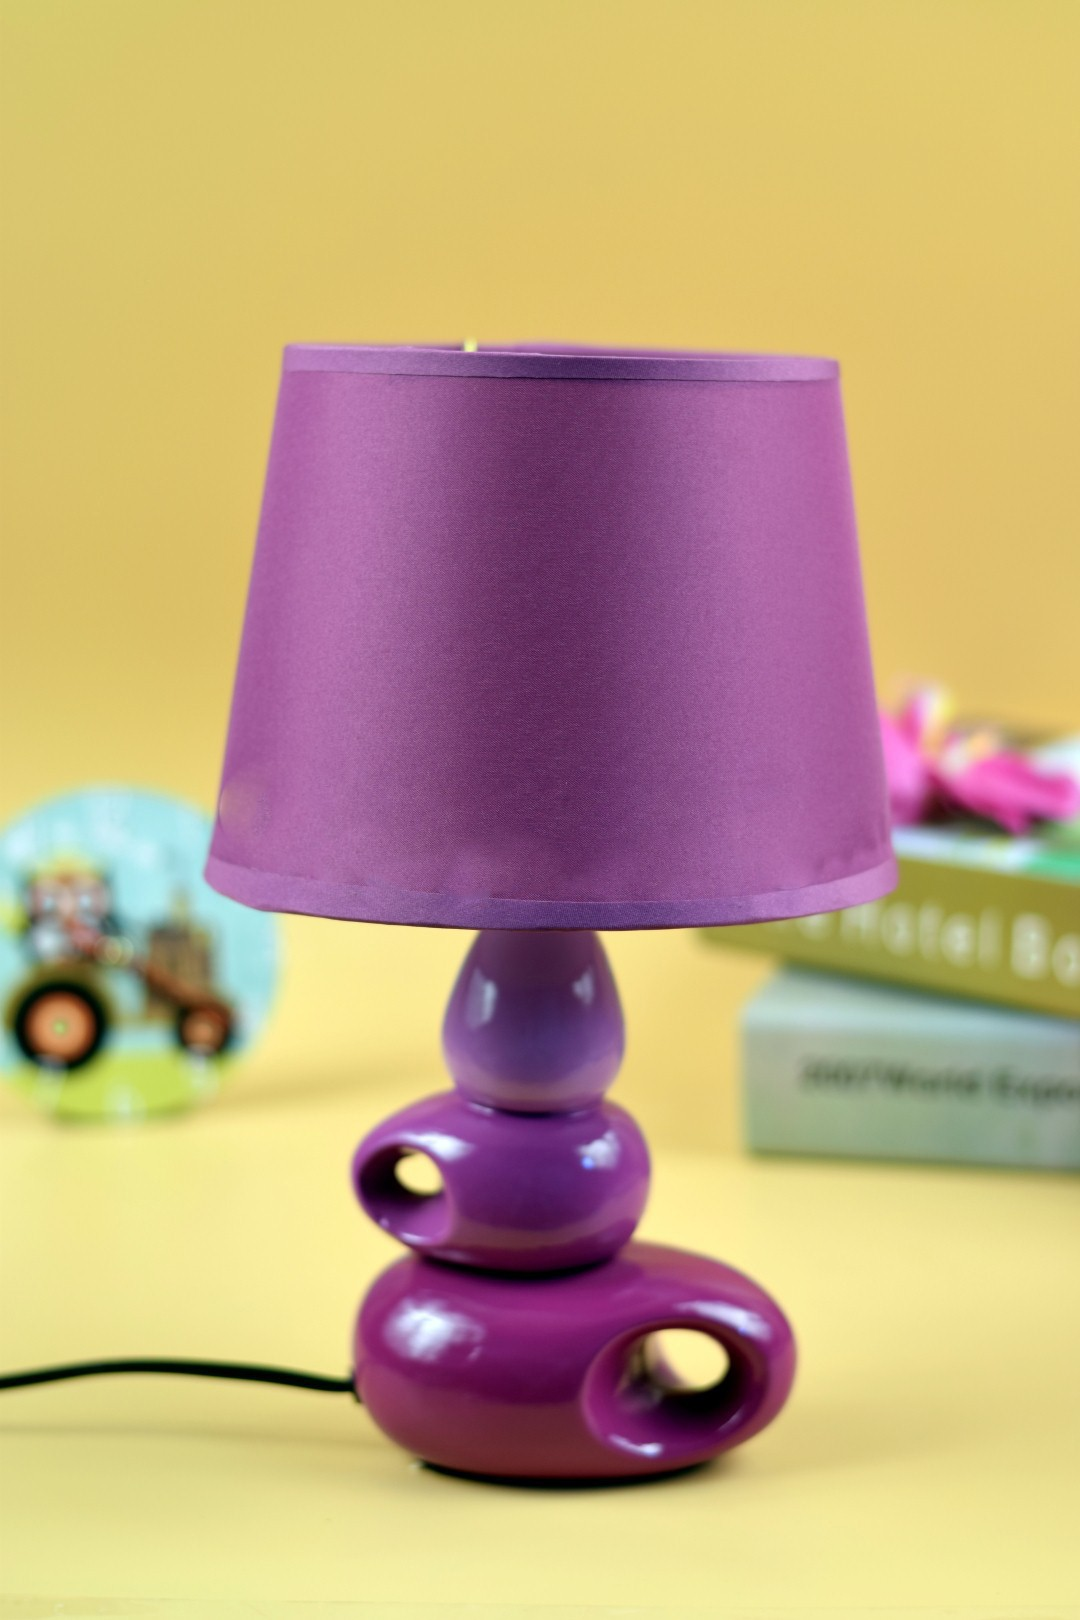 gojeeva geometrical table lamp